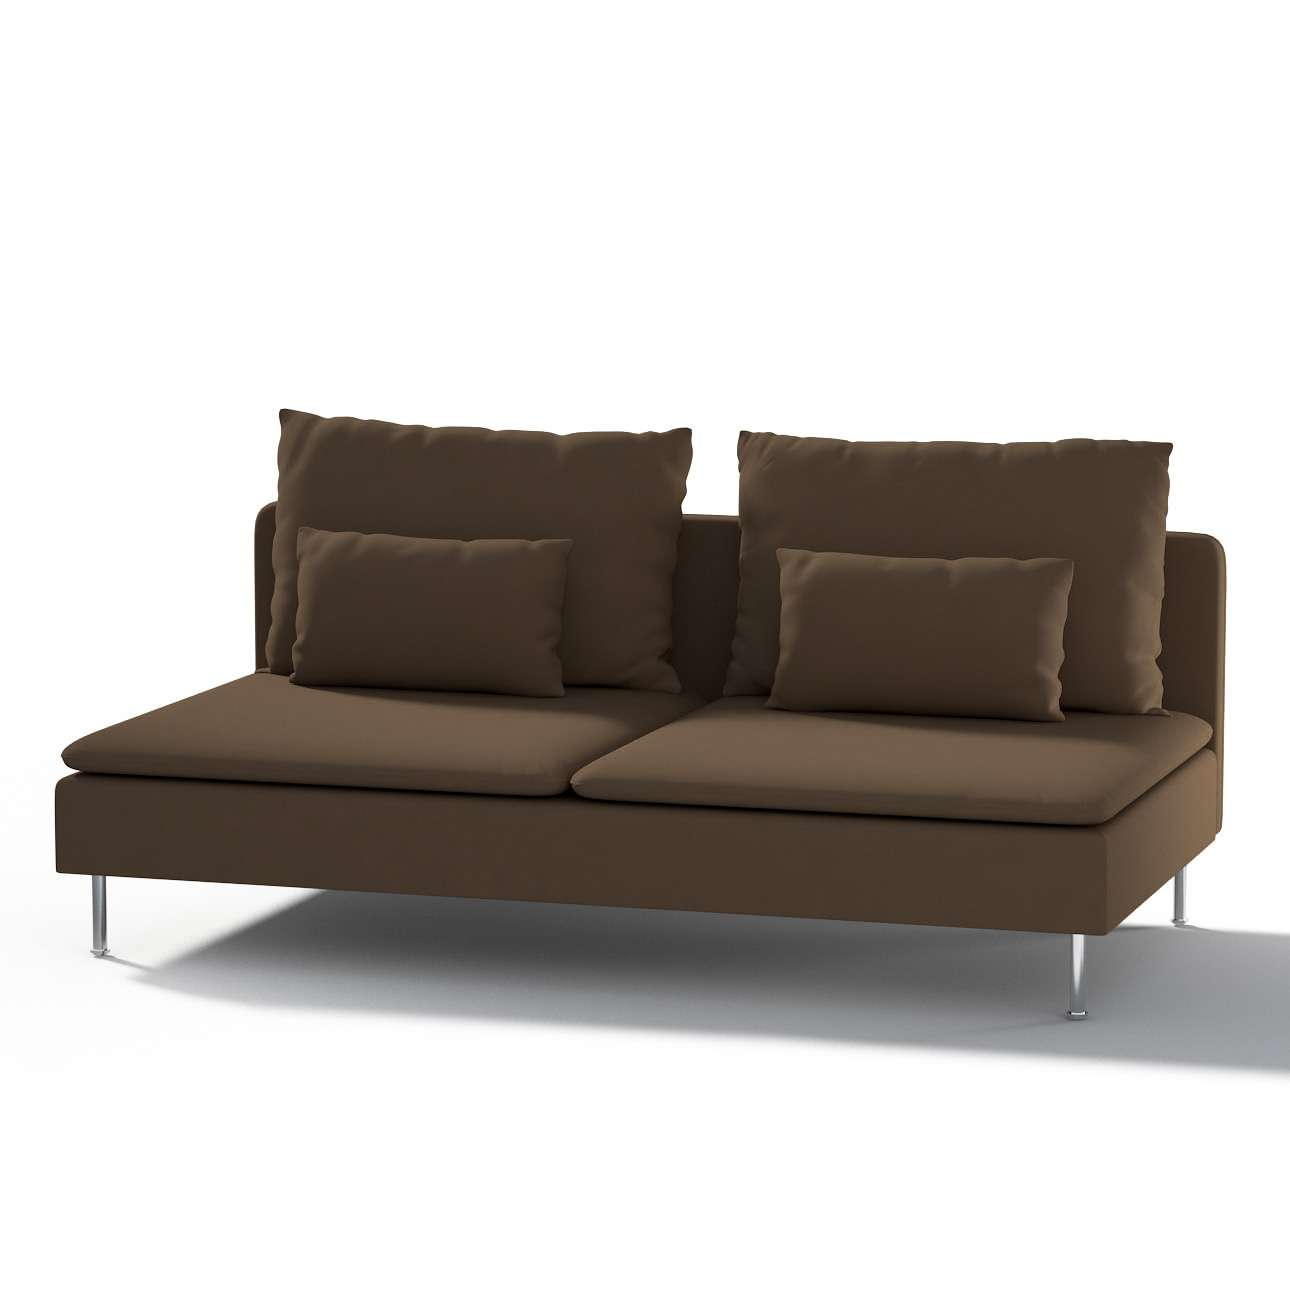 s derhamn bezug f r sitzelement 3 mocca dekoria. Black Bedroom Furniture Sets. Home Design Ideas